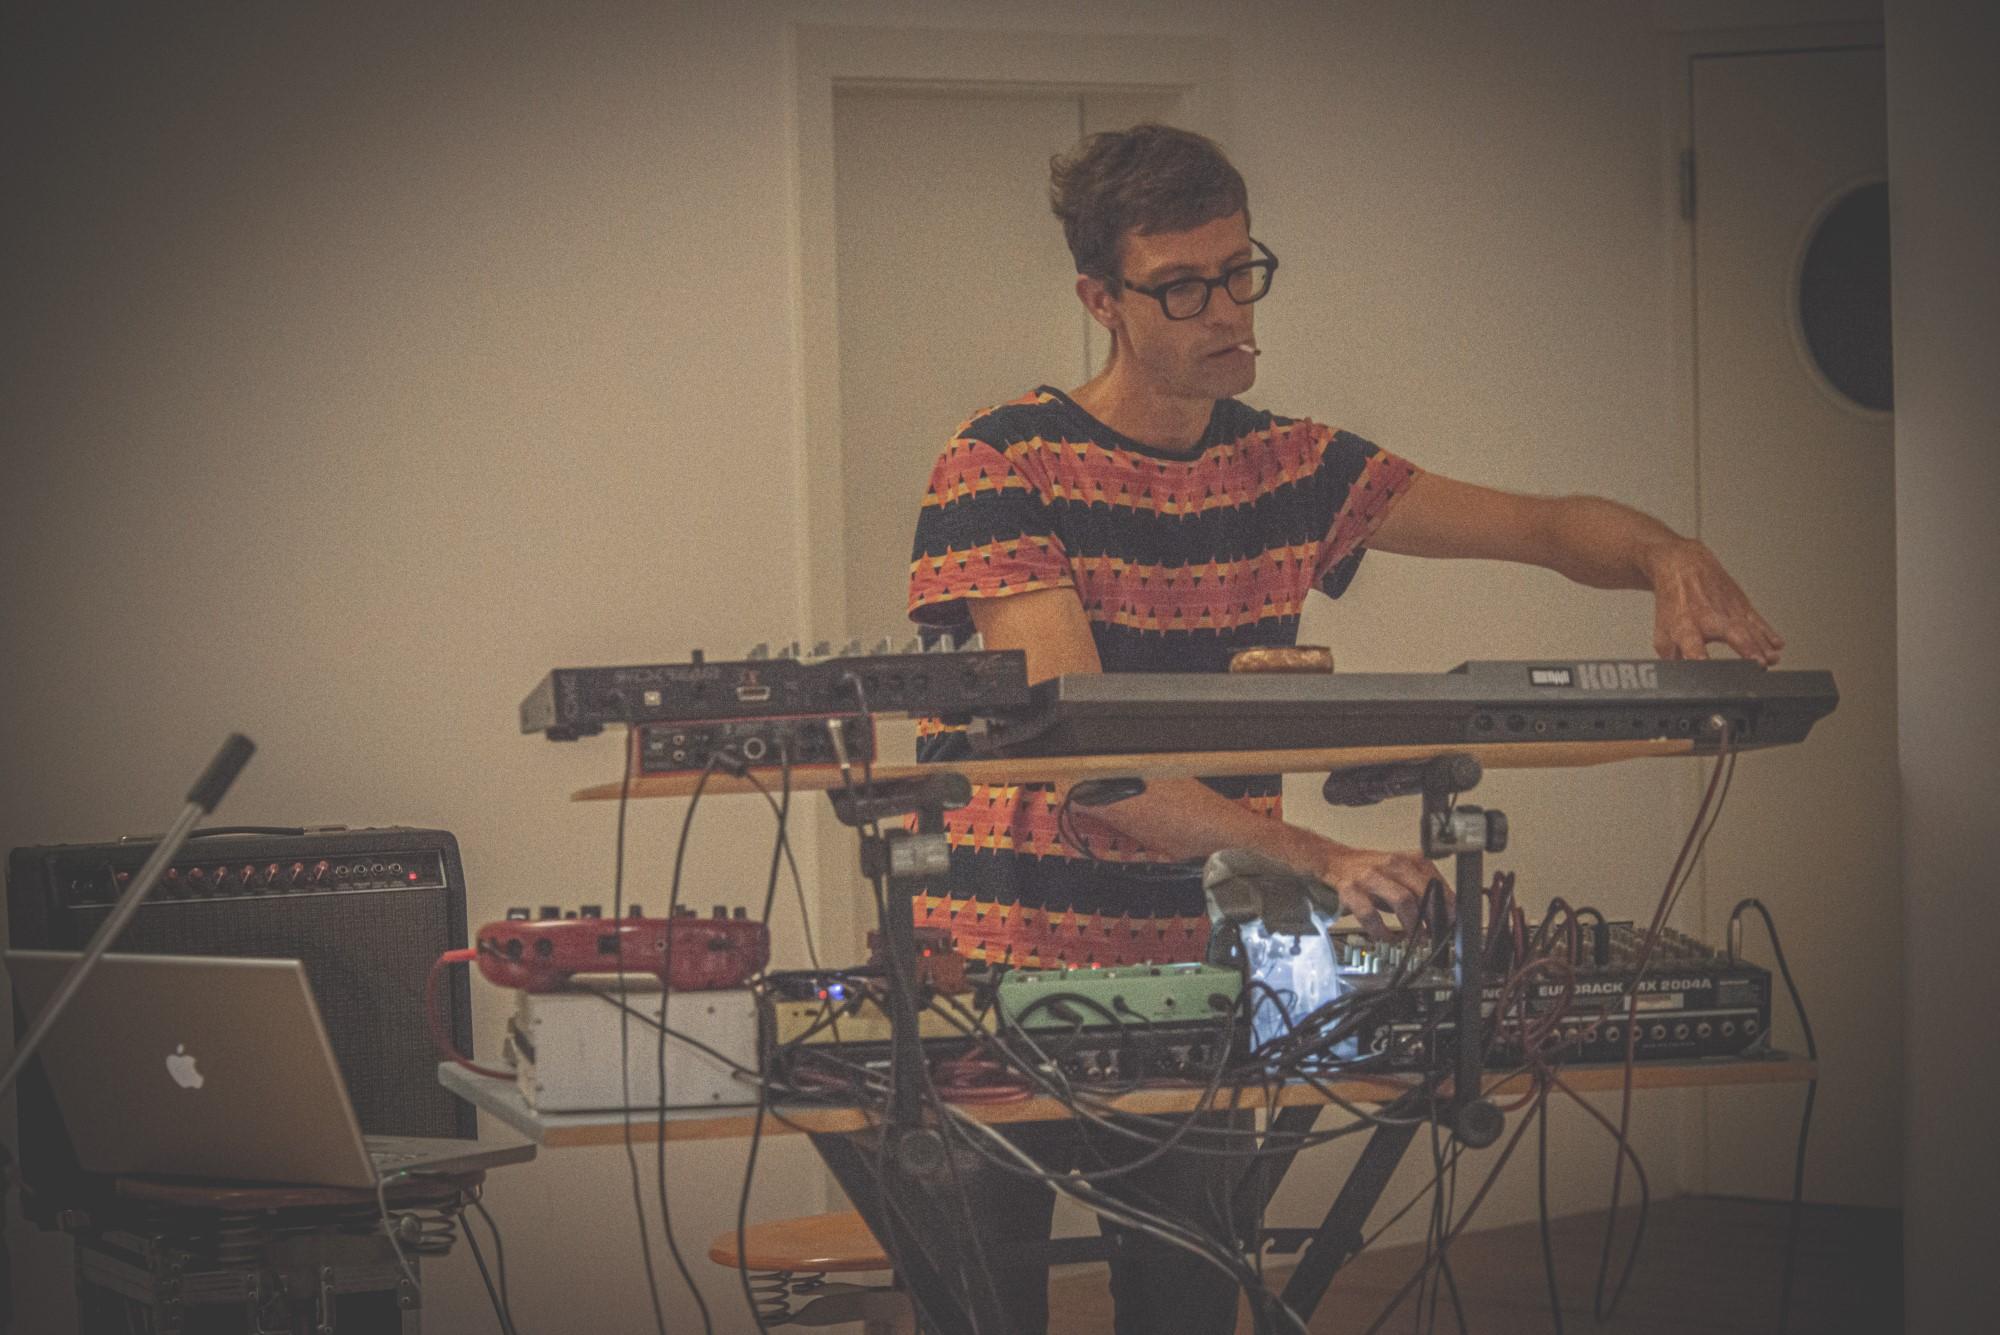 DSC 8671 - Loft and music